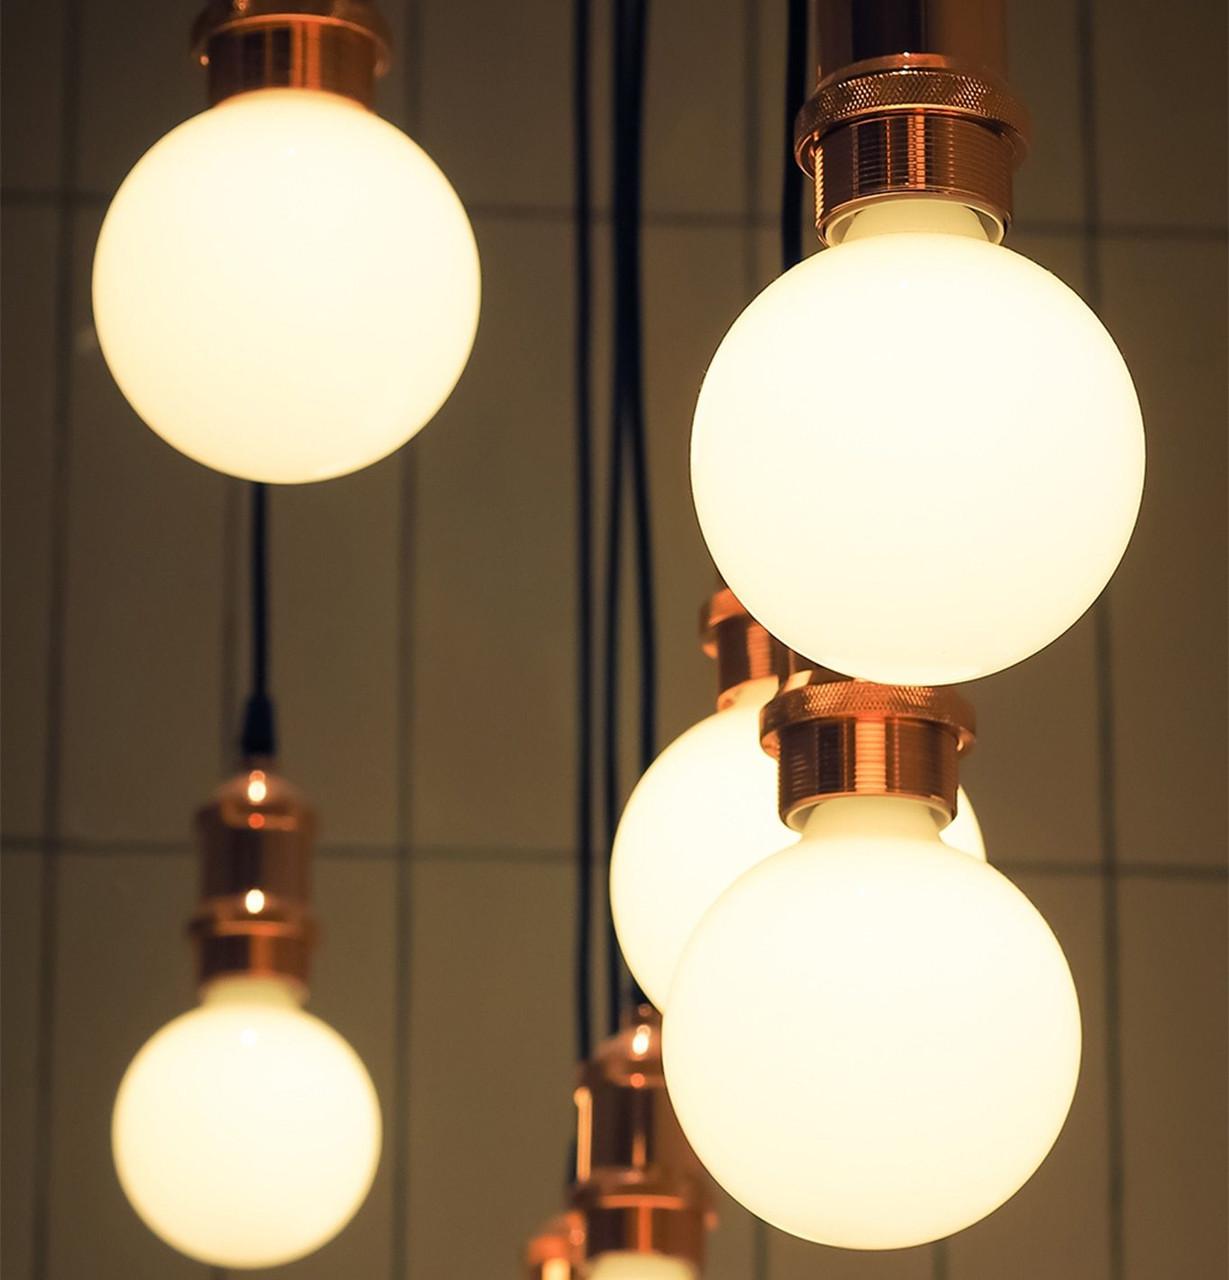 Crompton Lamps LED Globe Bayonet Light Bulbs